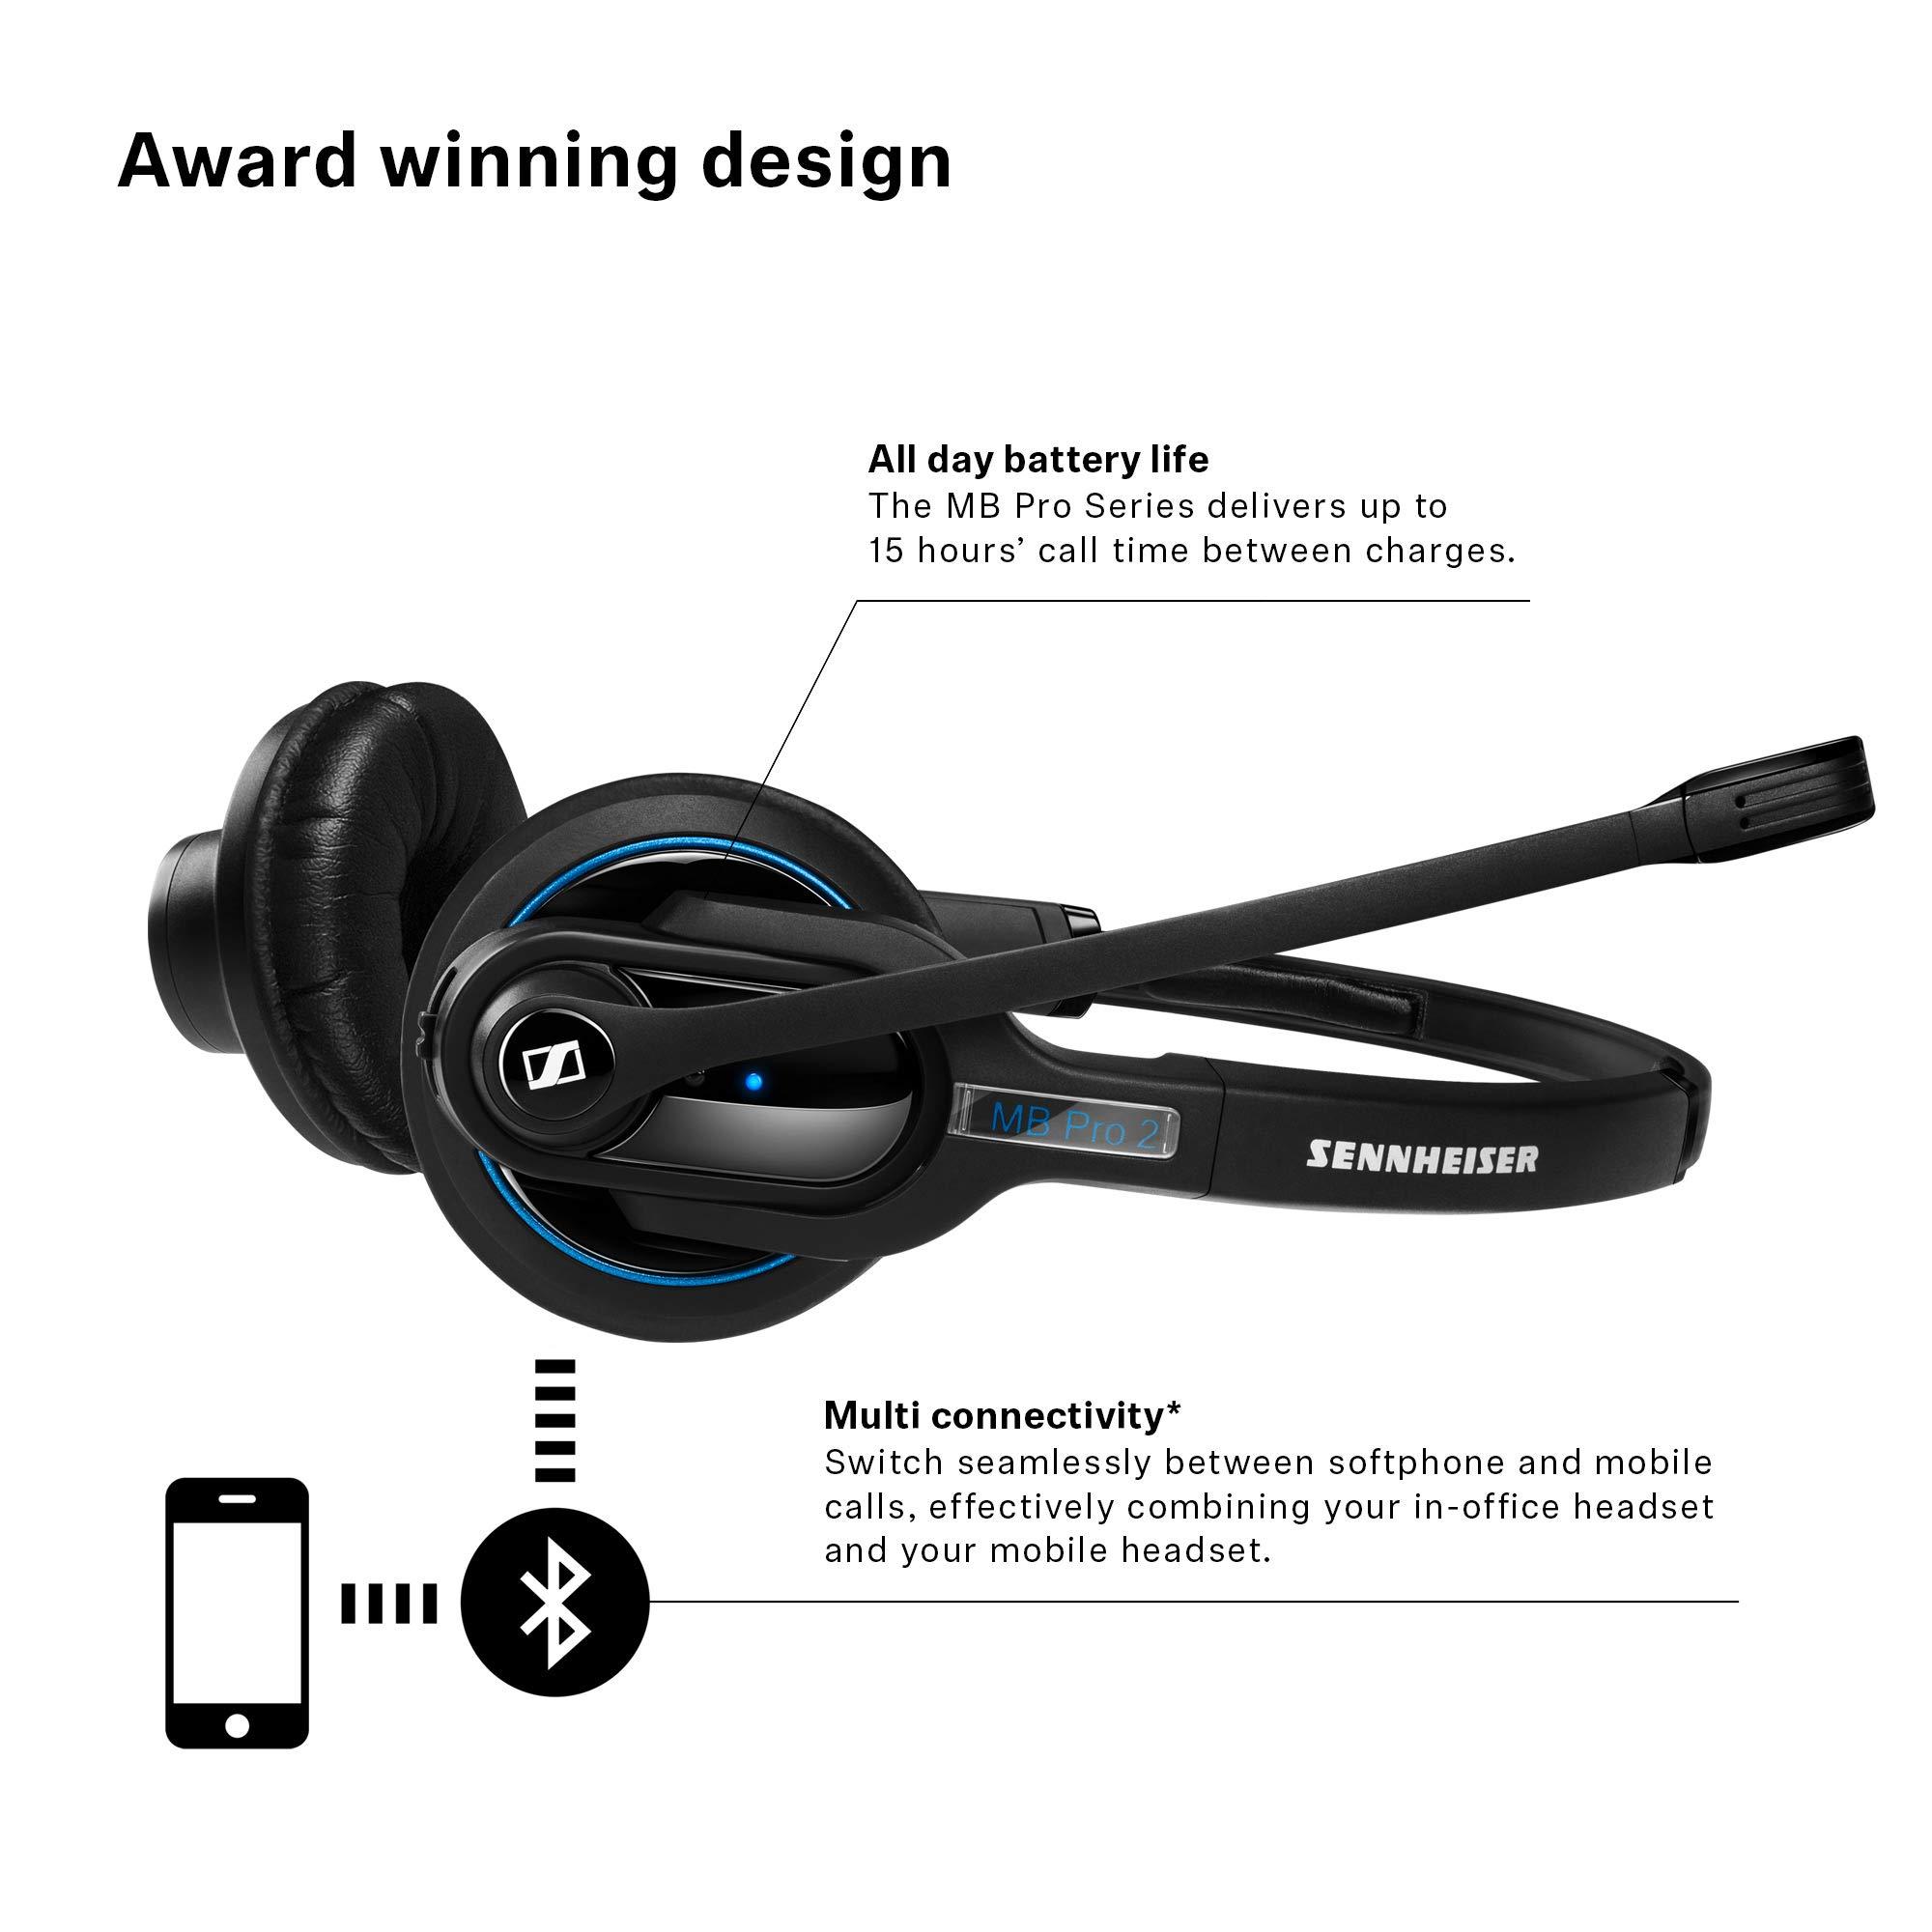 Sennheiser-Bluetooth-Headset-for-Universal-Devices